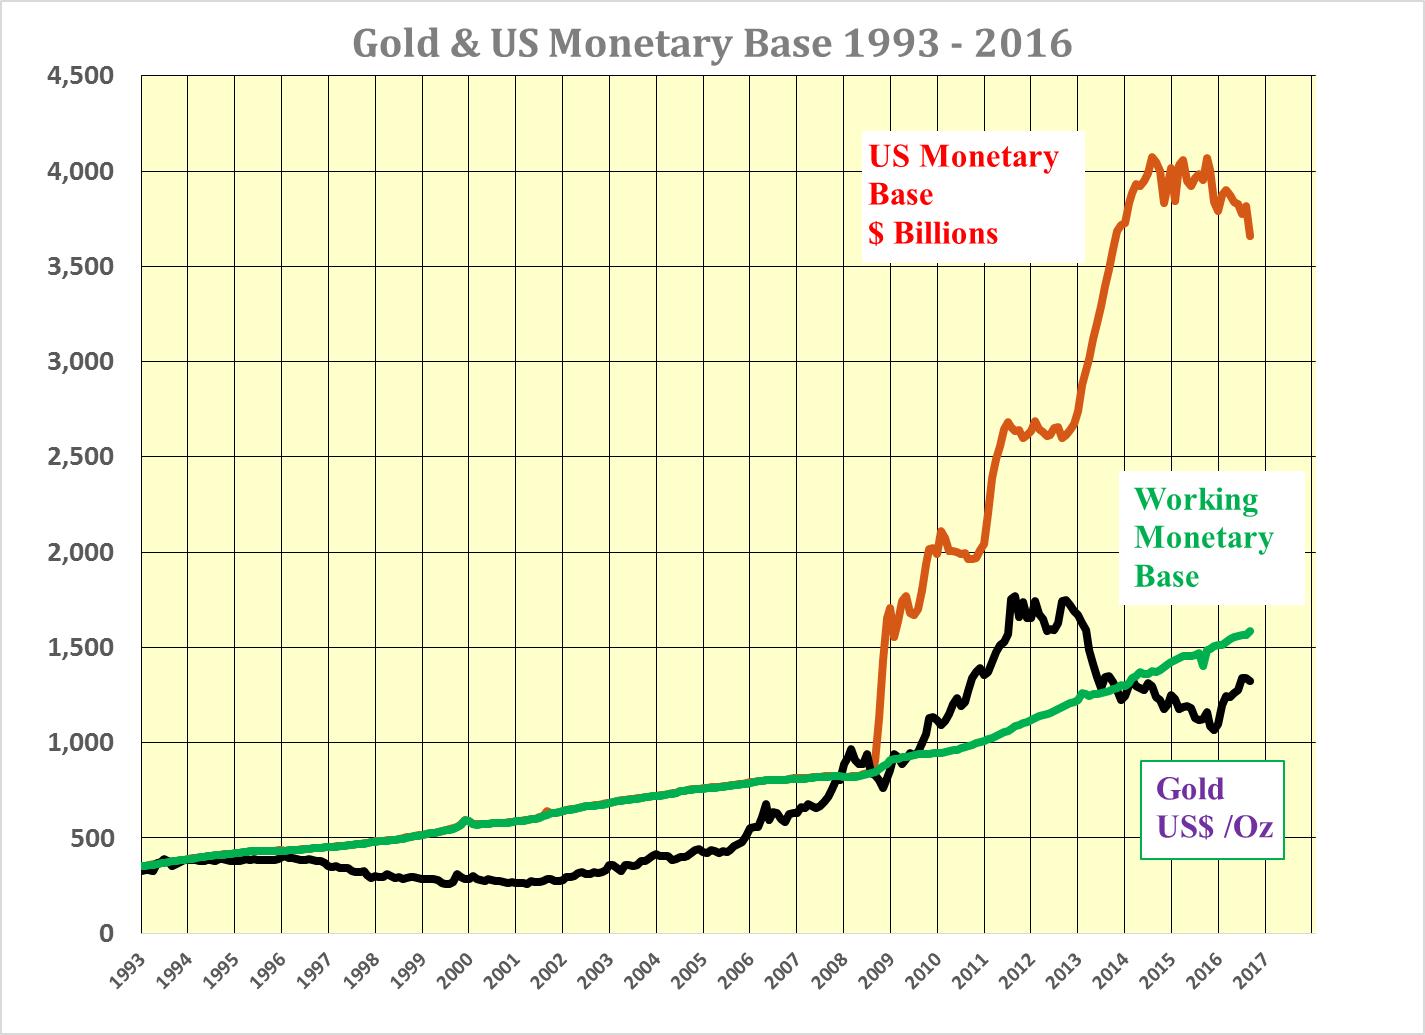 https://static.seekingalpha.com/uploads/2016/10/9/saupload_Gold-and-AWMB.png